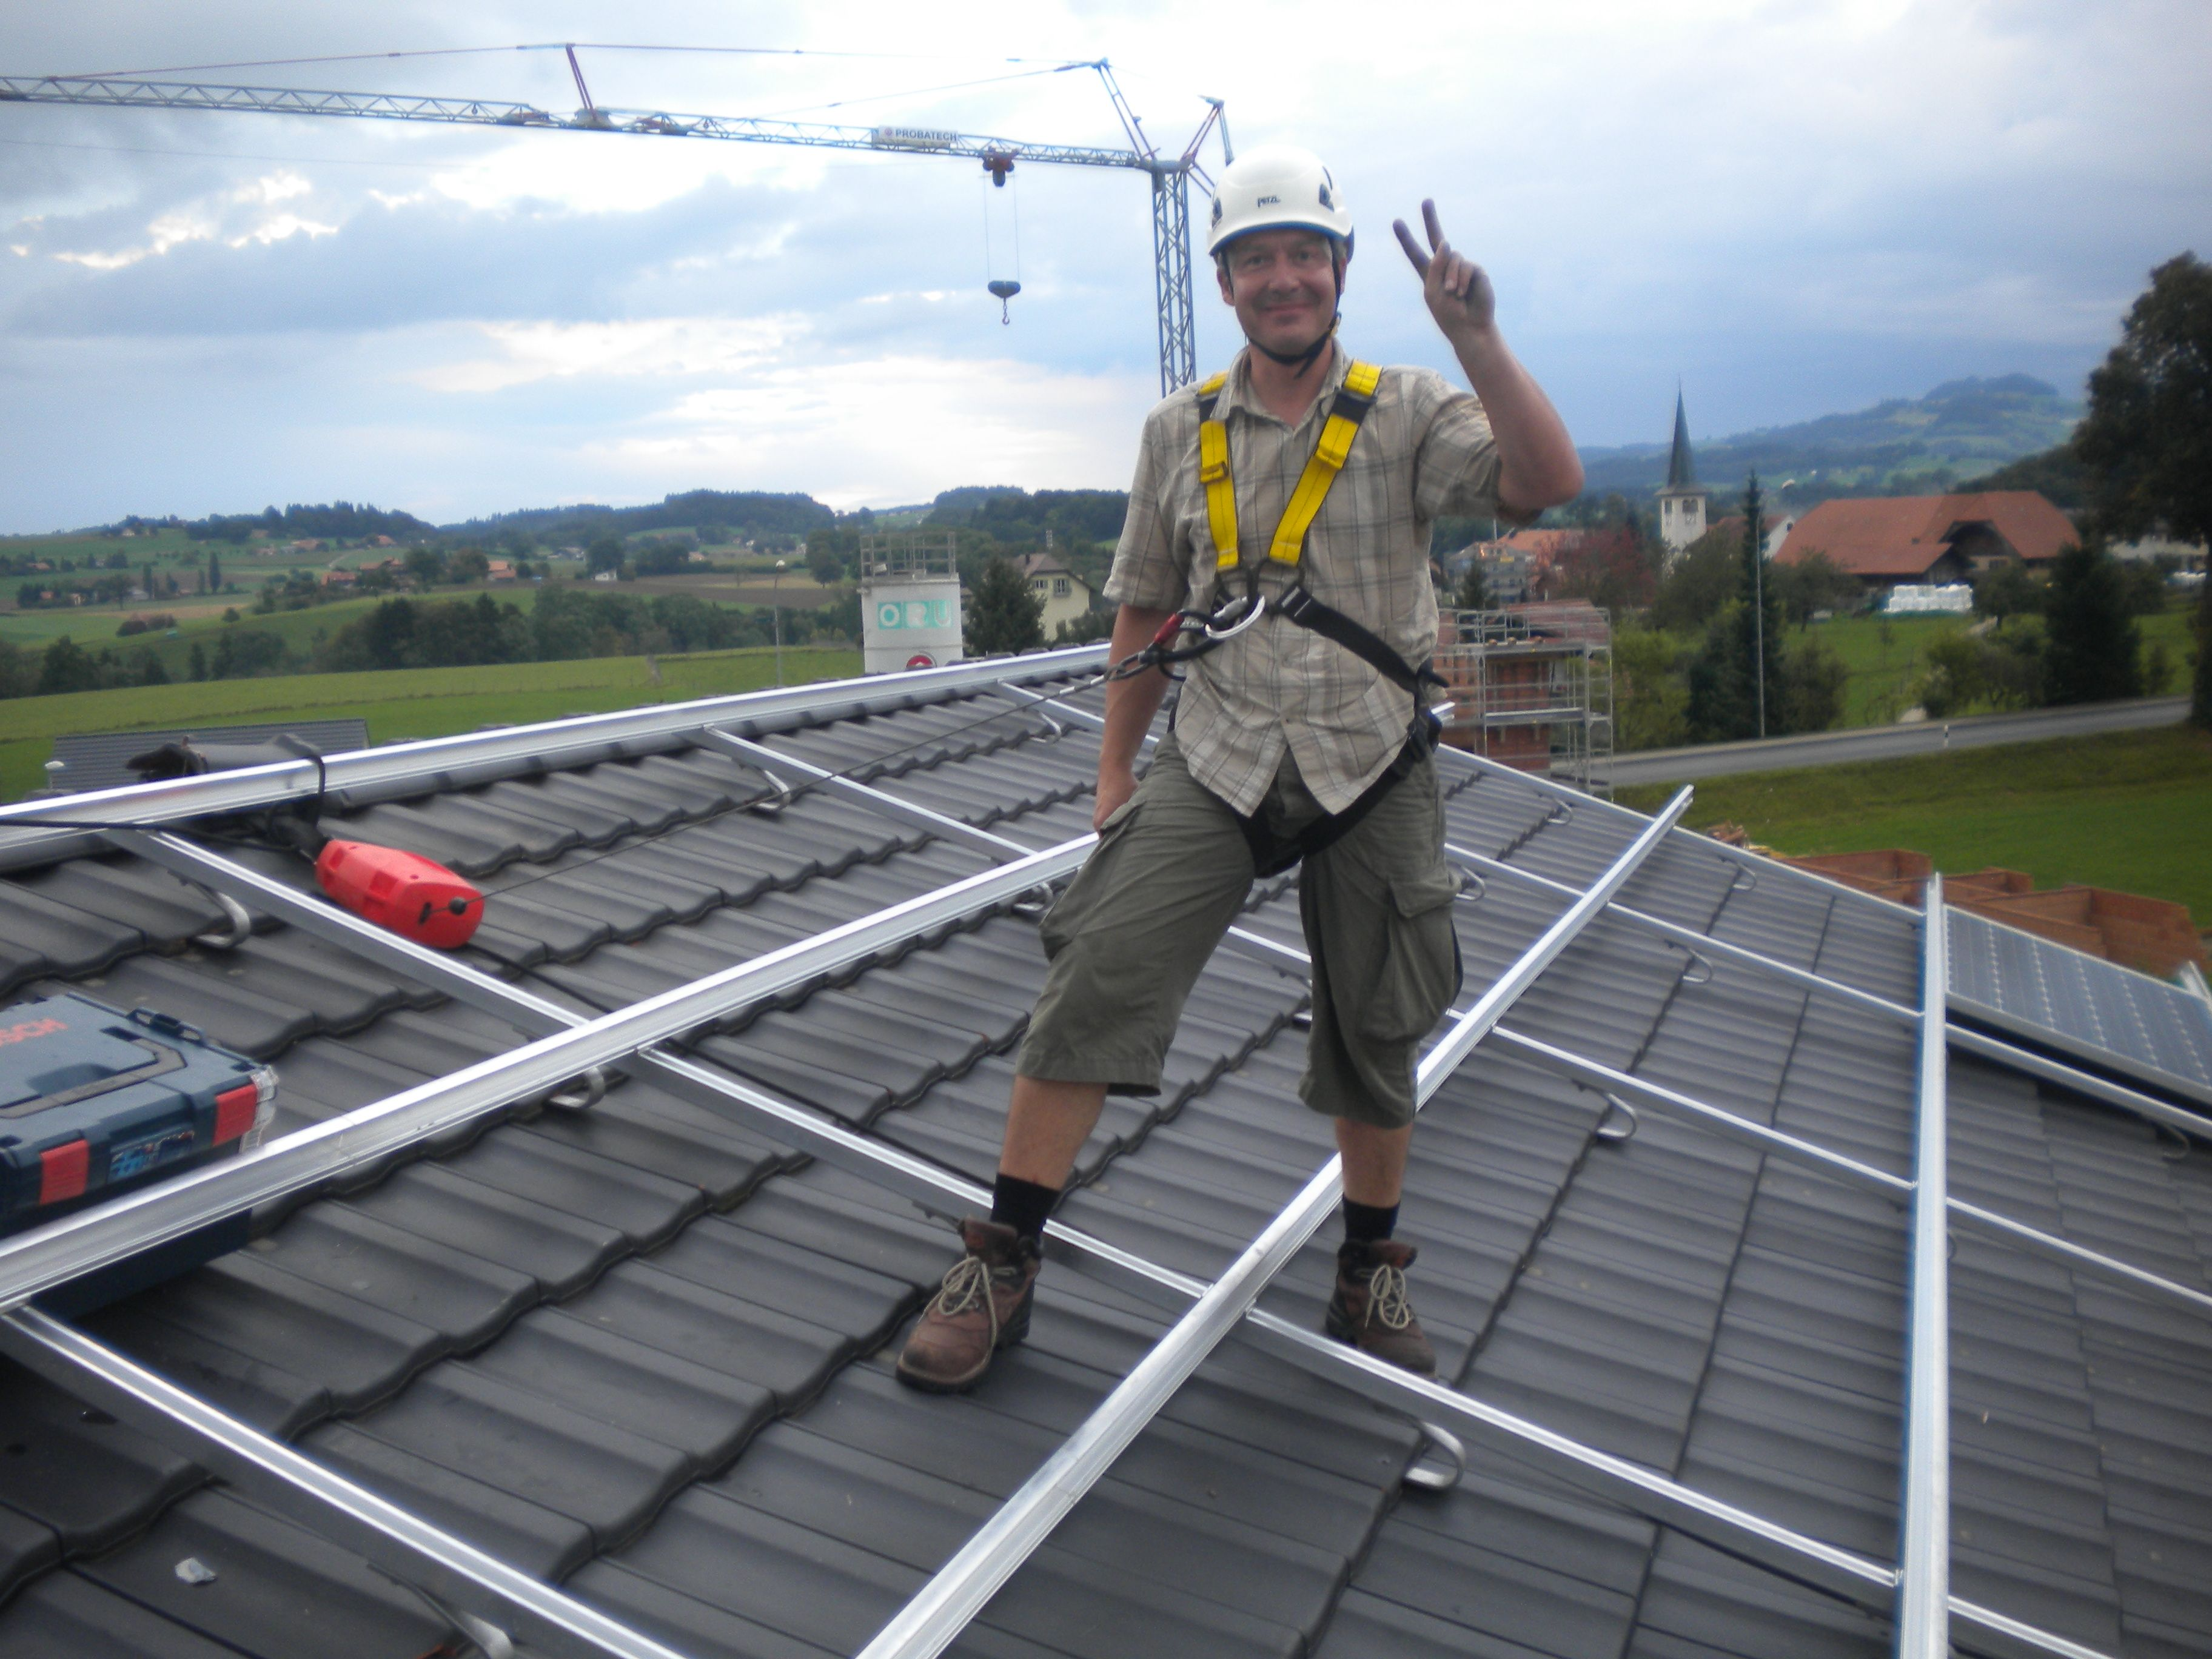 solar selber bauen good solar poolheizung selber bauen with solar selber bauen top v solar. Black Bedroom Furniture Sets. Home Design Ideas